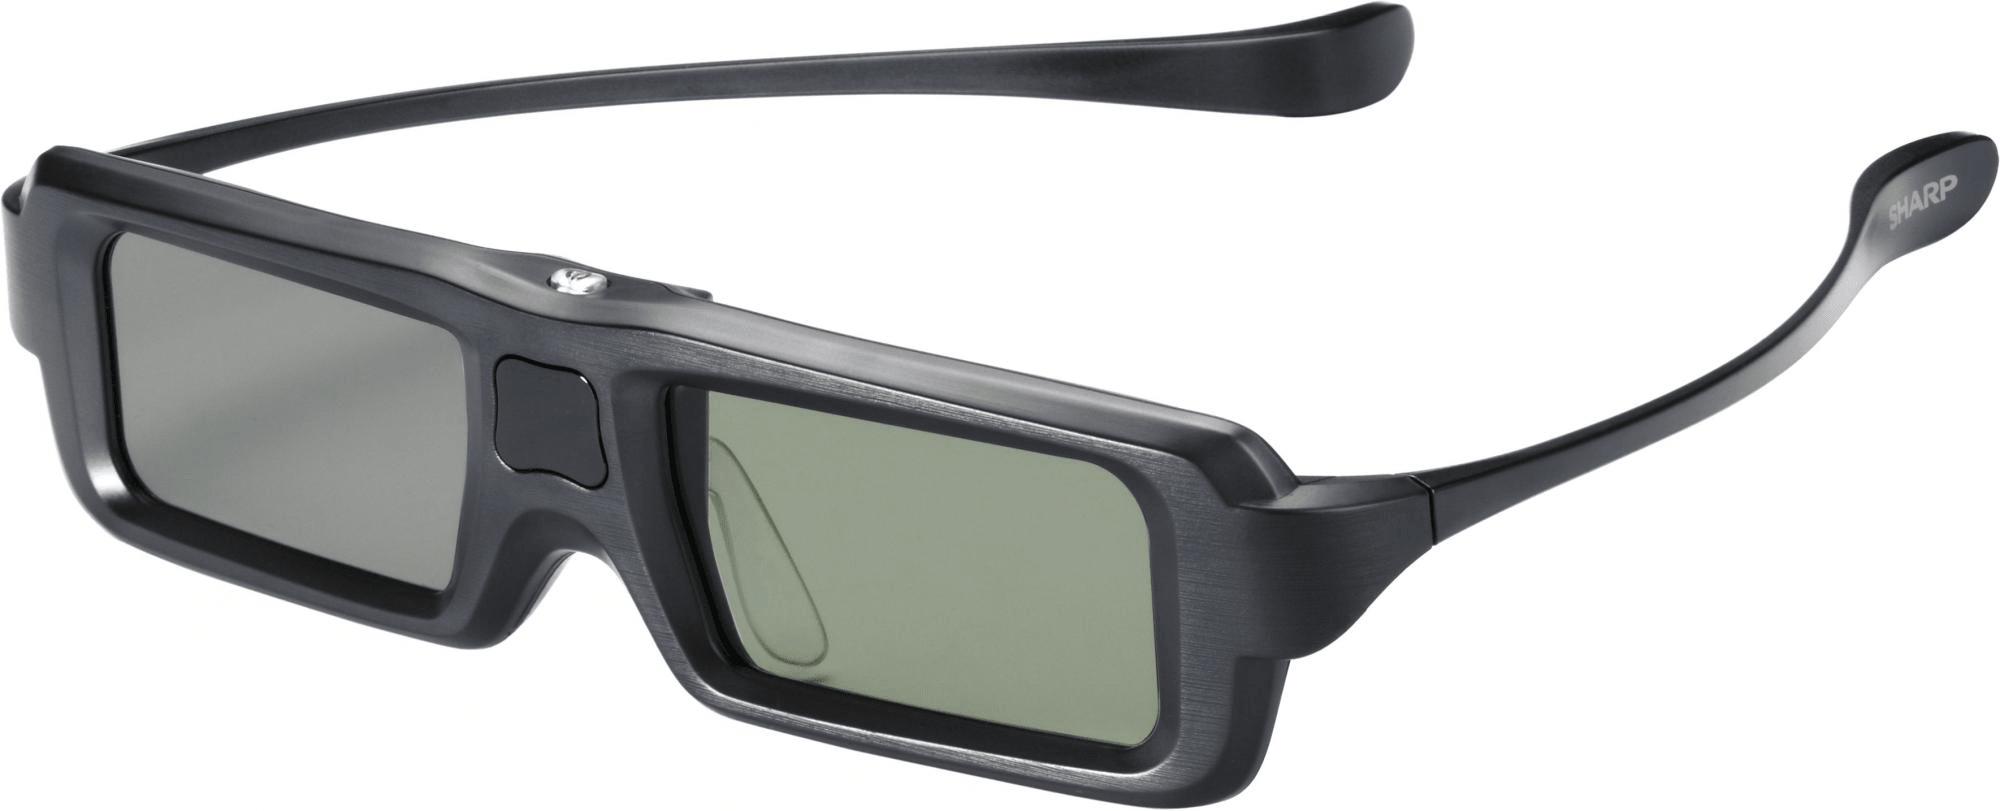 Televízory Sharp - Tovar.sk 66e1490da8a